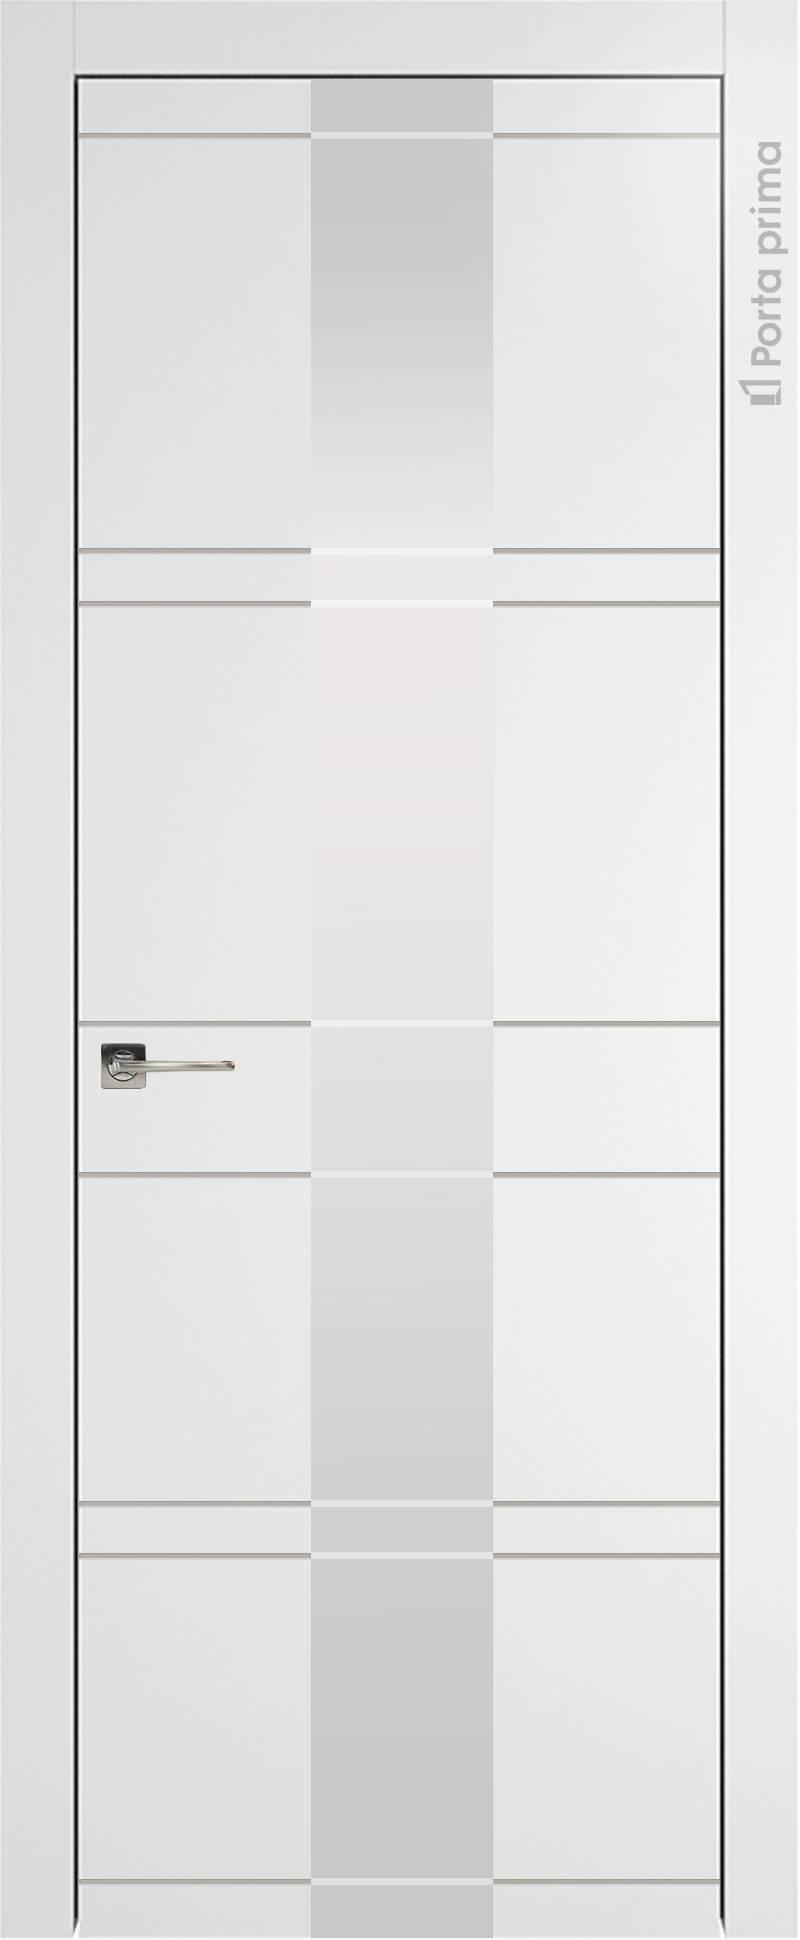 Tivoli Ж-2 цвет - Белая эмаль (RAL 9003) Со стеклом (ДО)